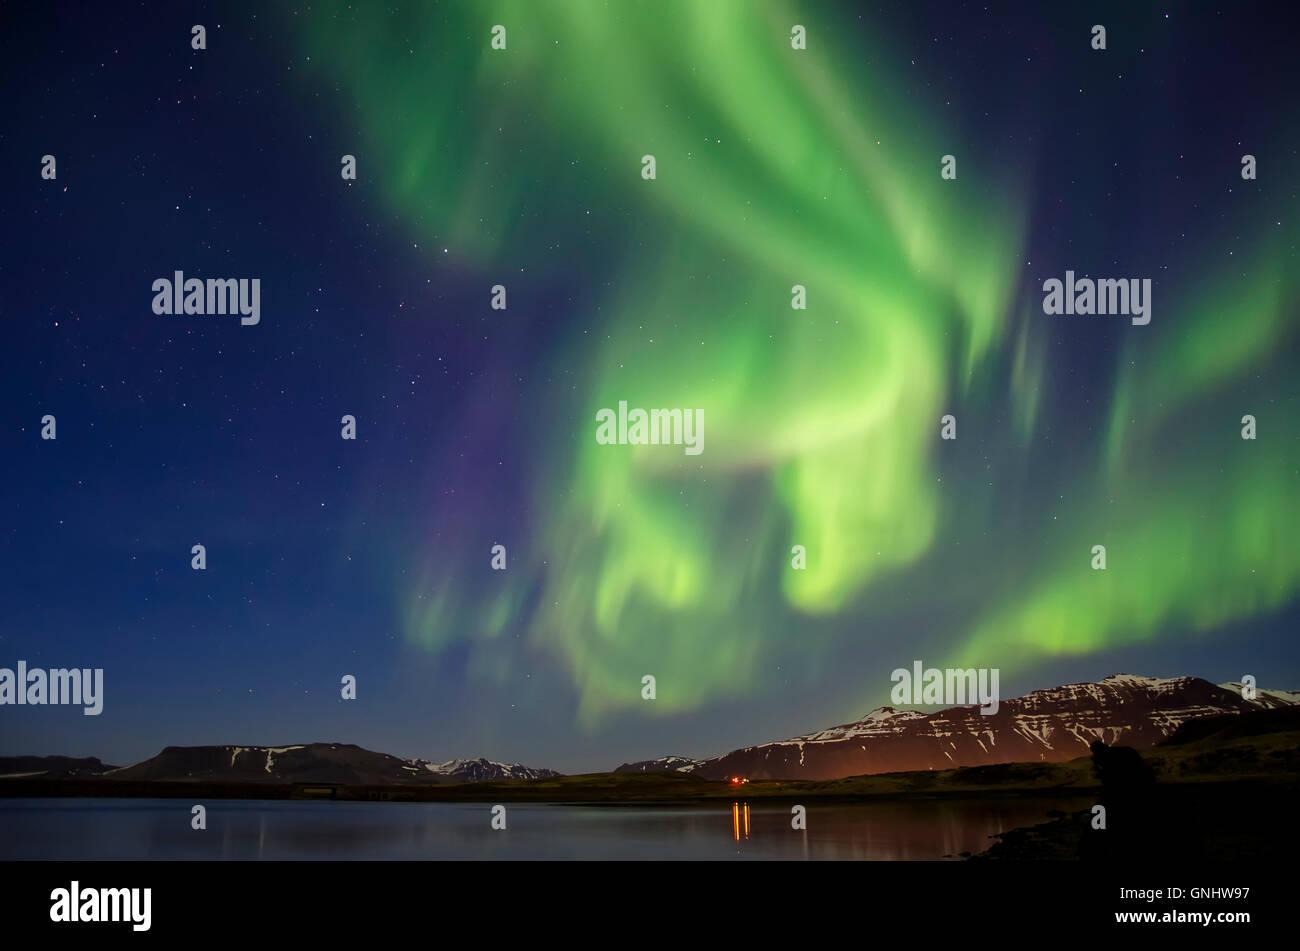 Aurora Borealis in Iceland - Stock Image